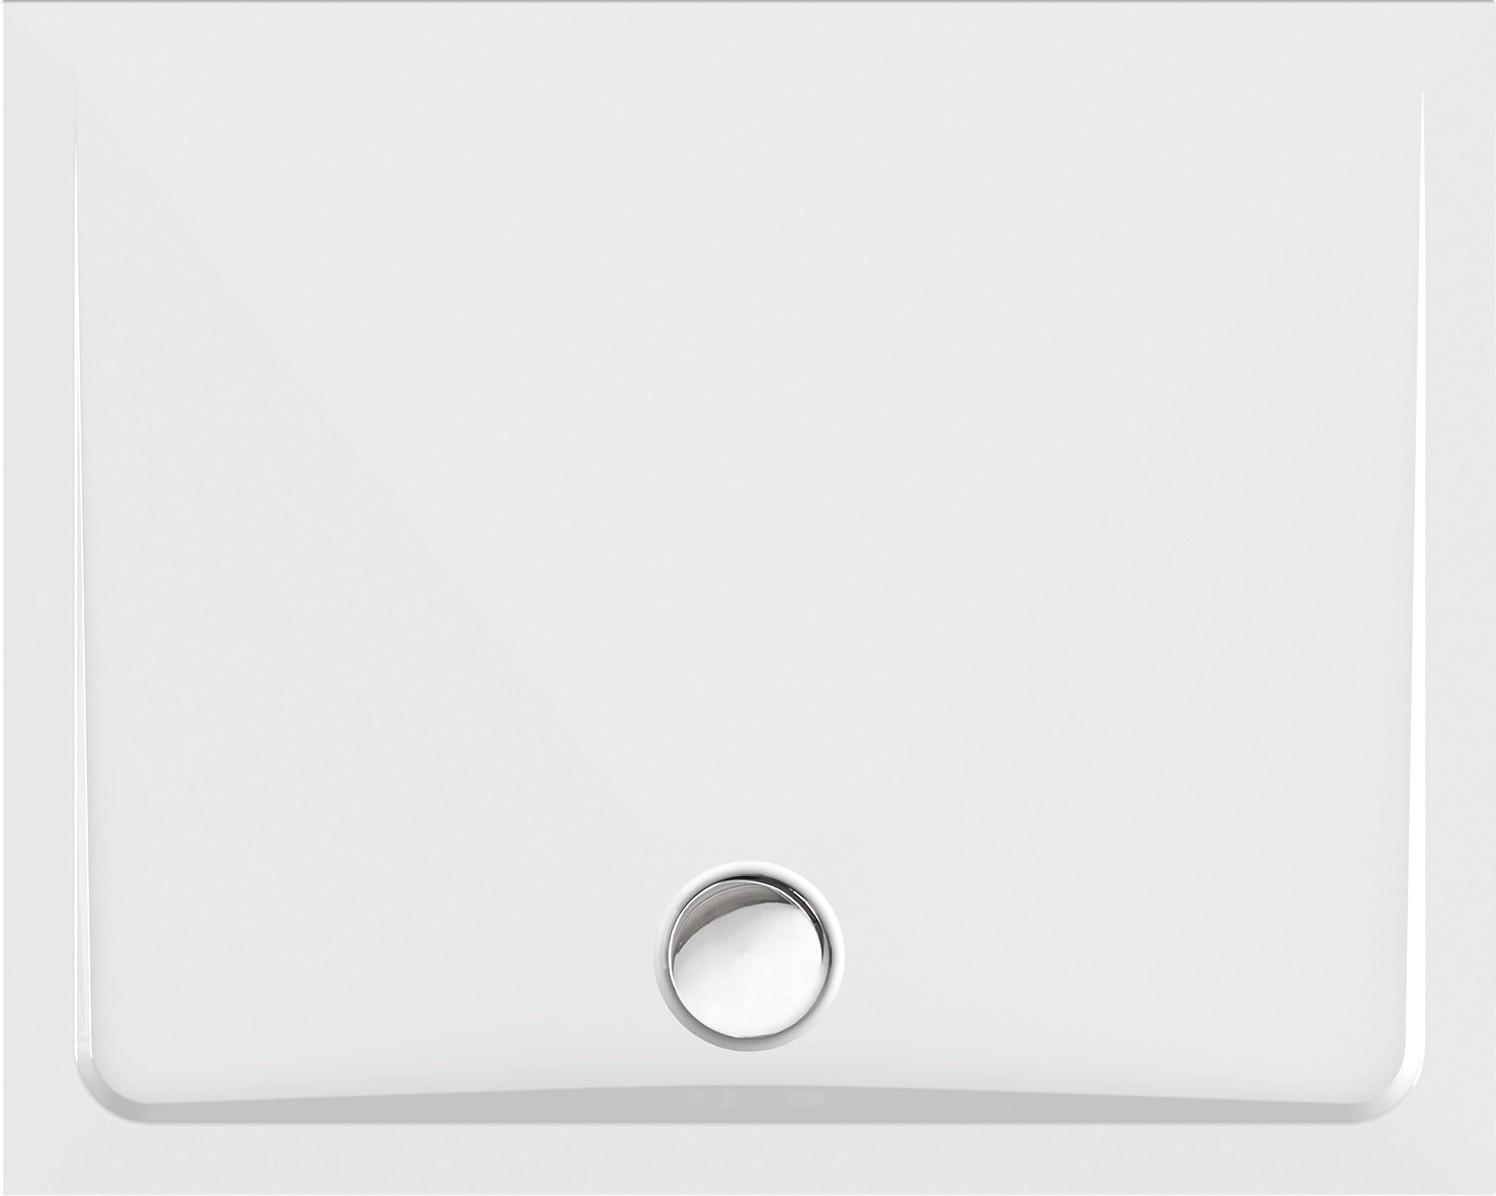 duschtasse superflach 100 x 80 x 2 5 cm wei duschwanne. Black Bedroom Furniture Sets. Home Design Ideas